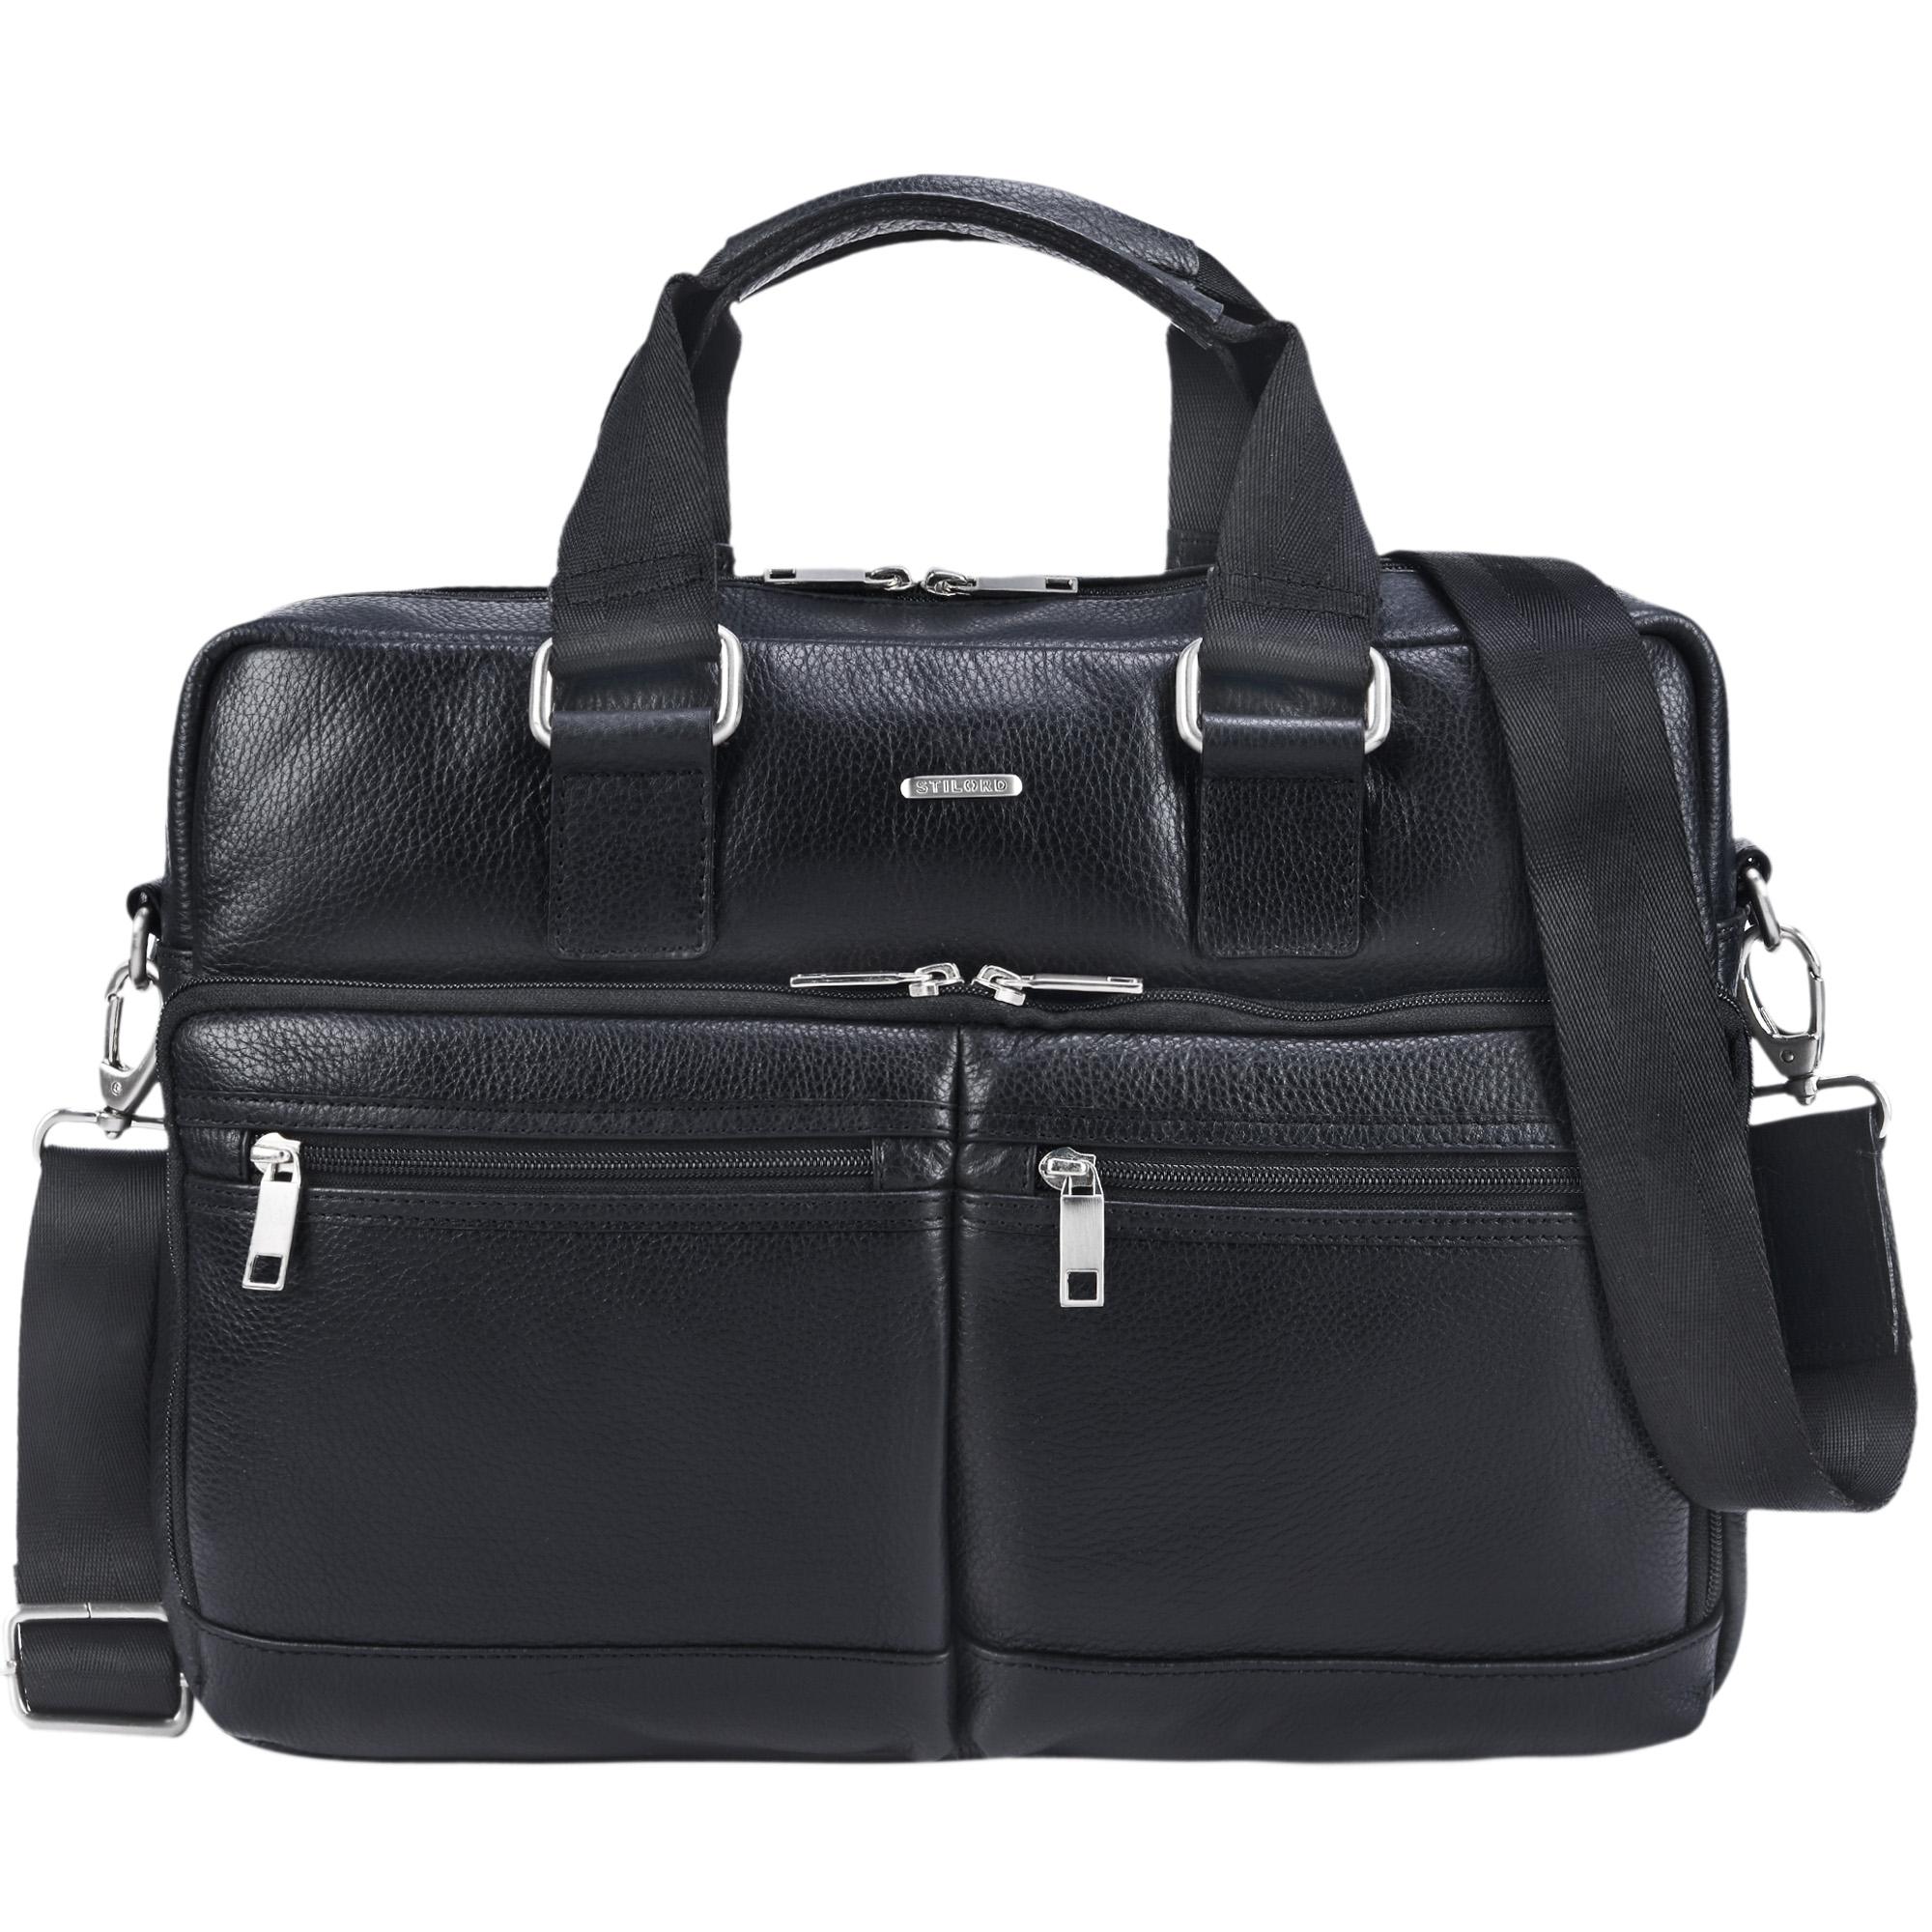 stilord vito vintage businesstasche leder herren damen 14 zoll laptoptasche umh ngetasche. Black Bedroom Furniture Sets. Home Design Ideas